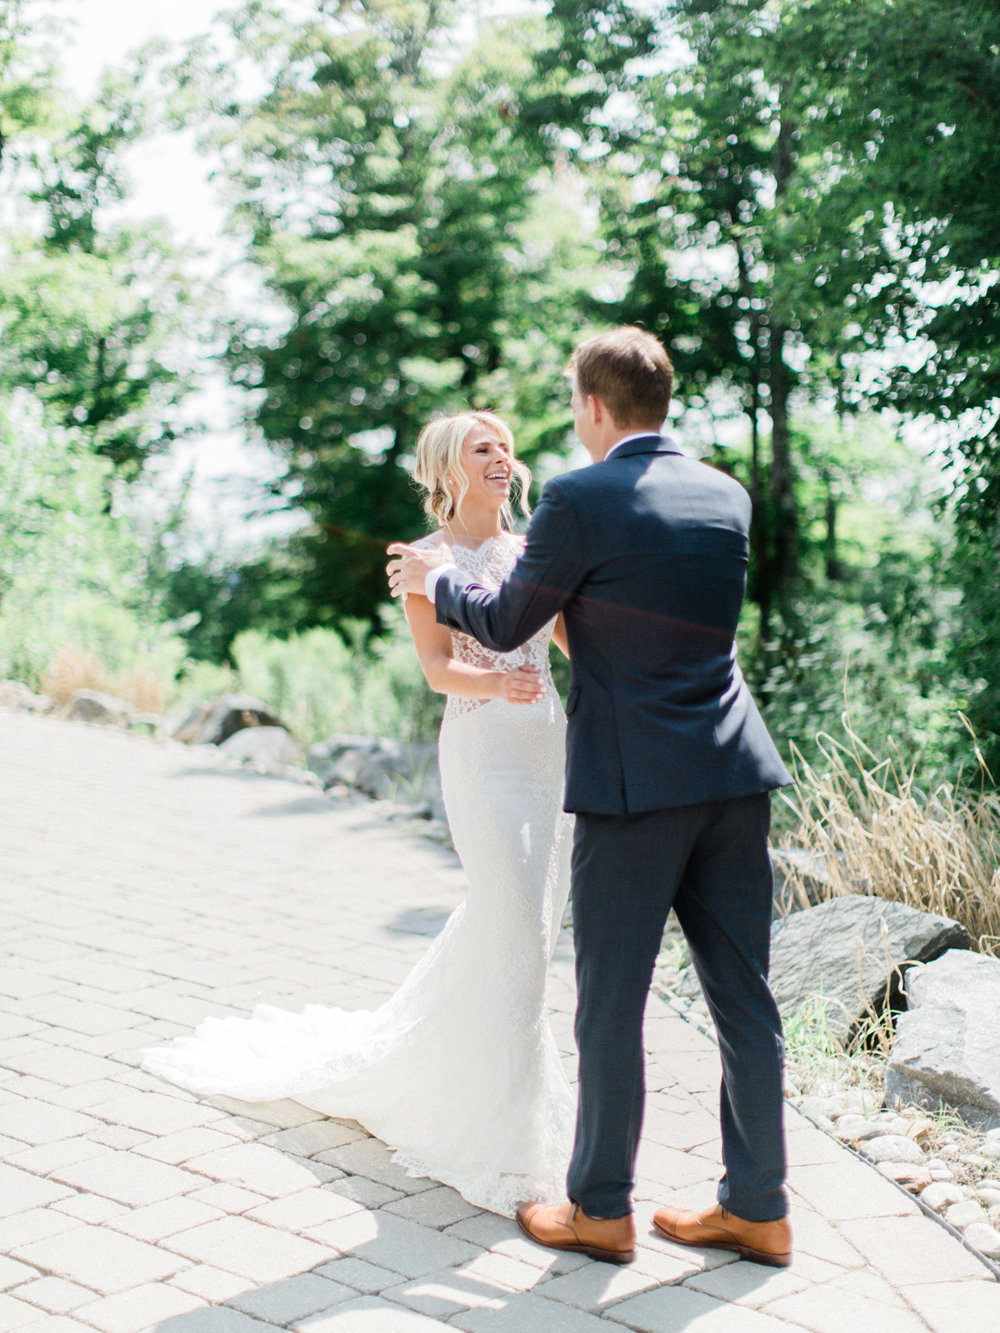 Toronto-Muskoka-wedding-photographer-summery-fun-documentary-the-marriott-rosseau31.jpg